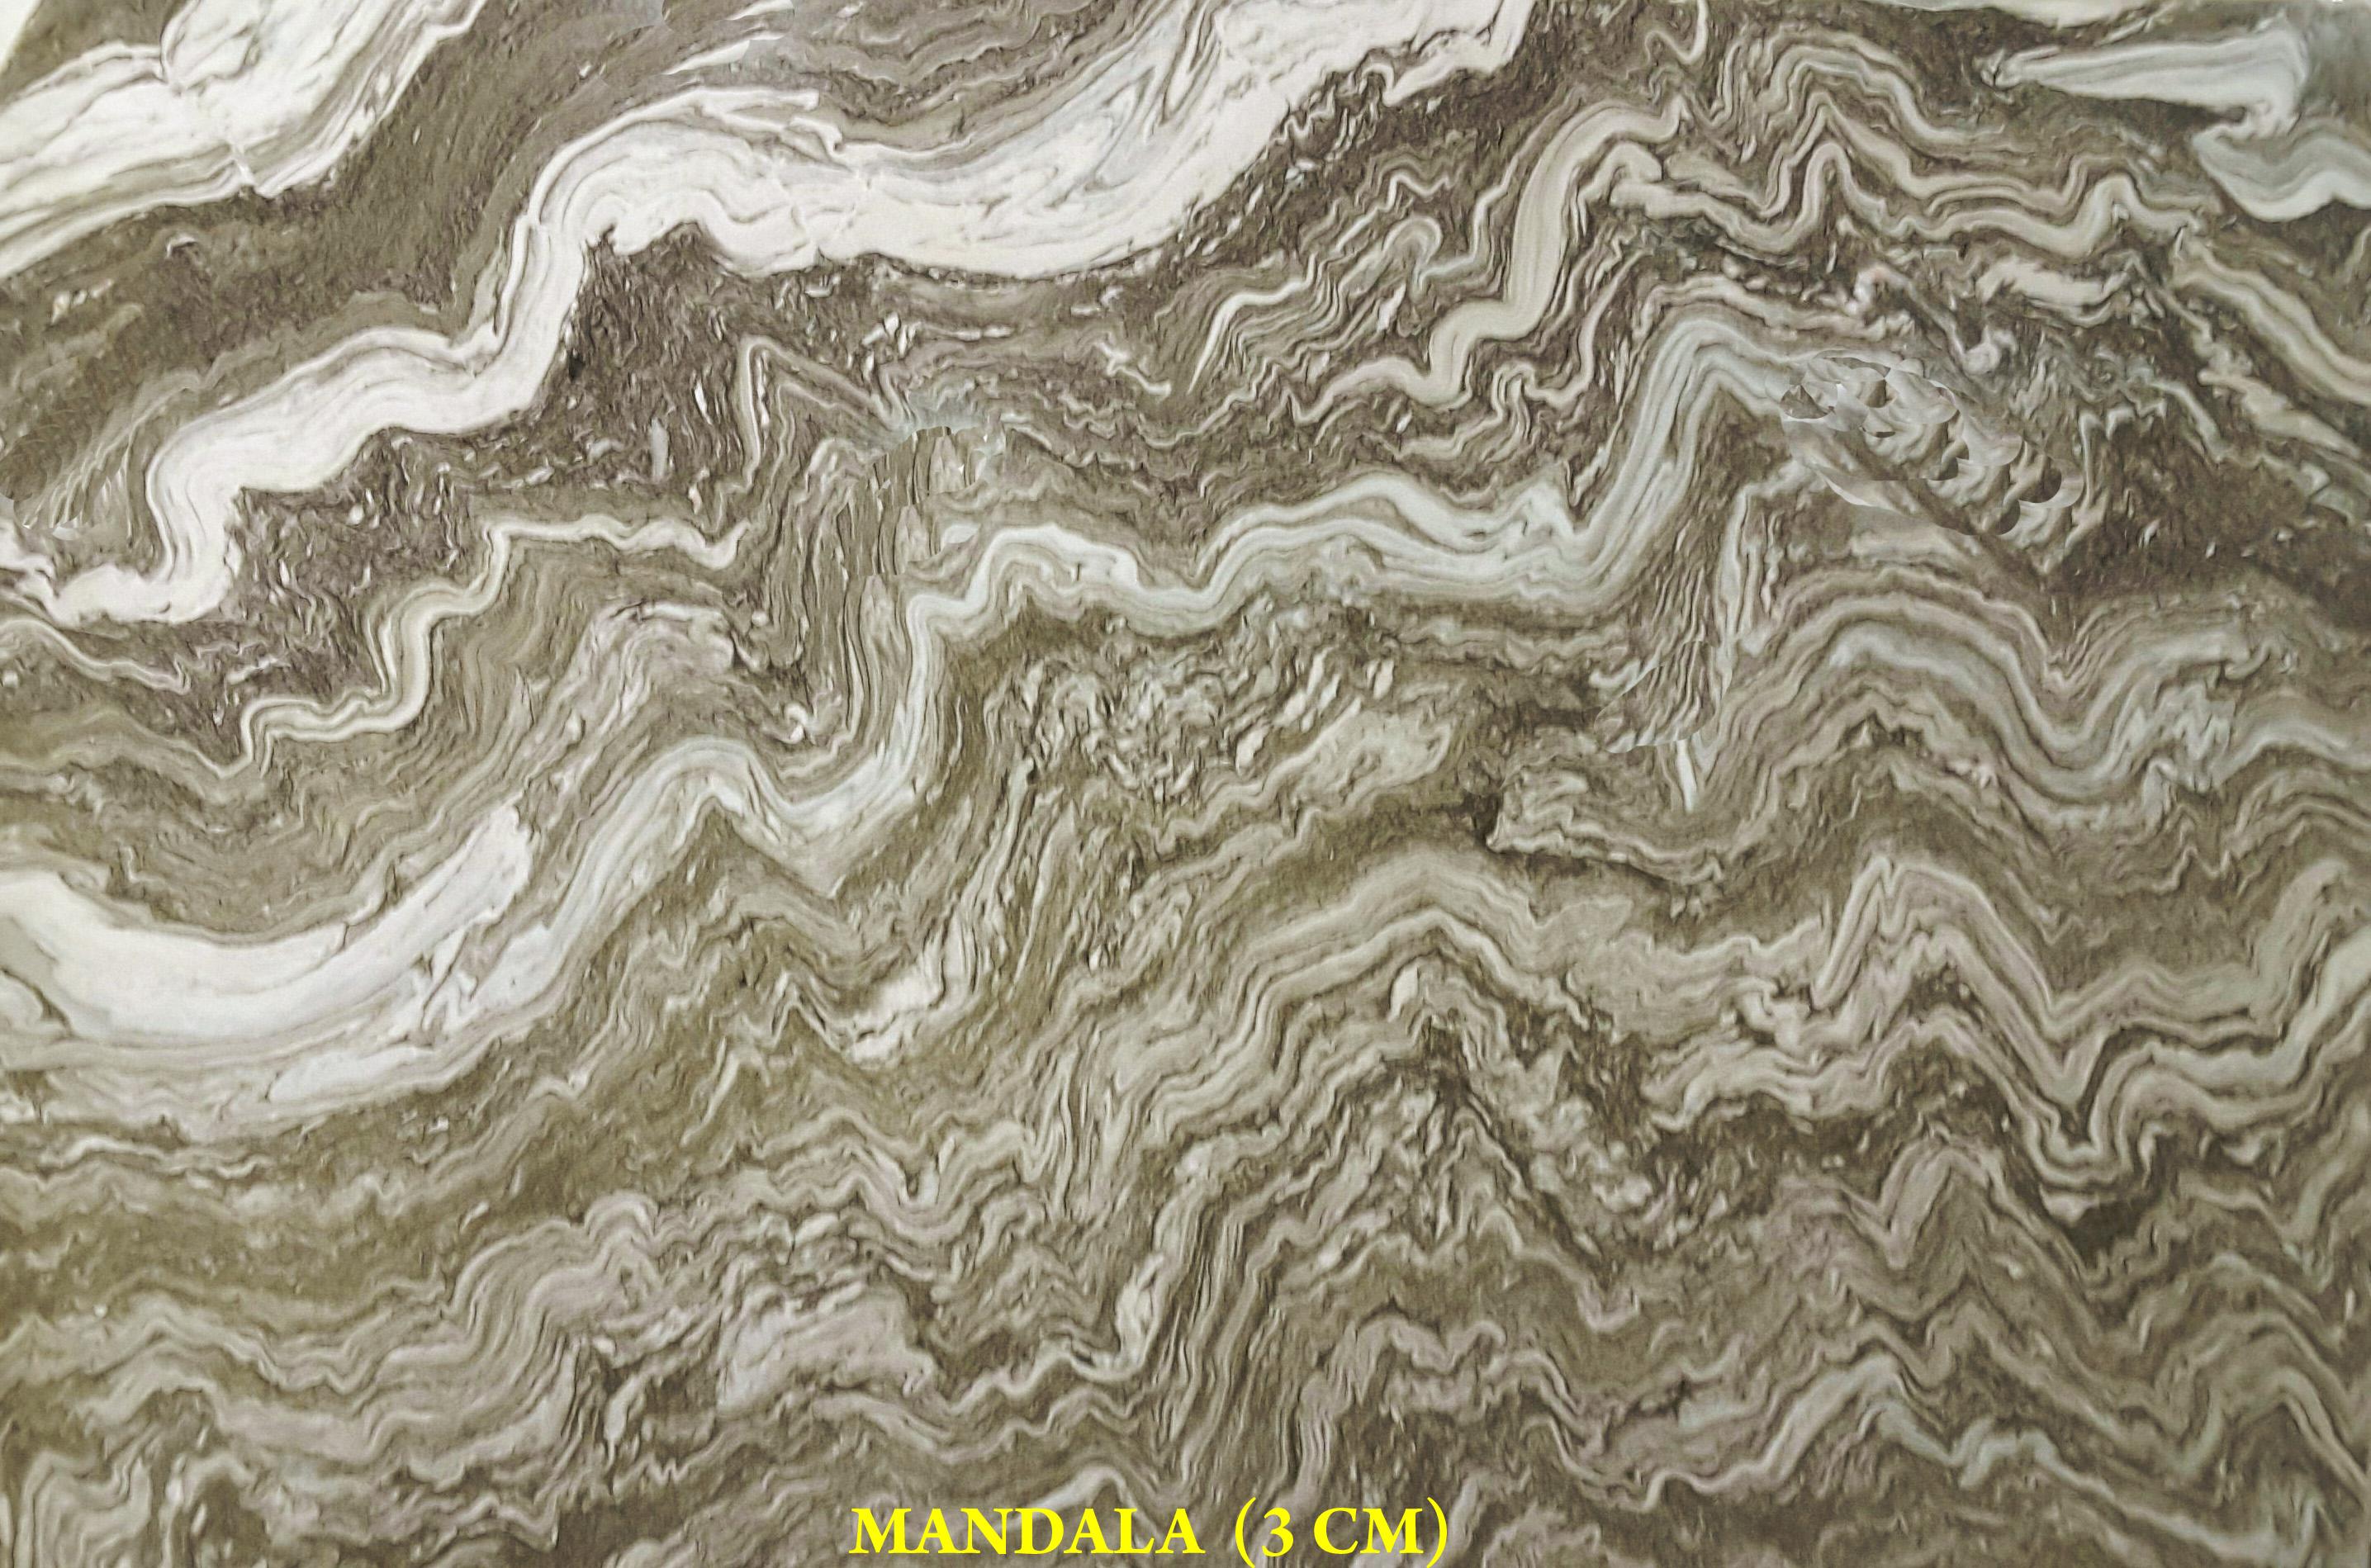 MANDALA (3 CM)-#11753